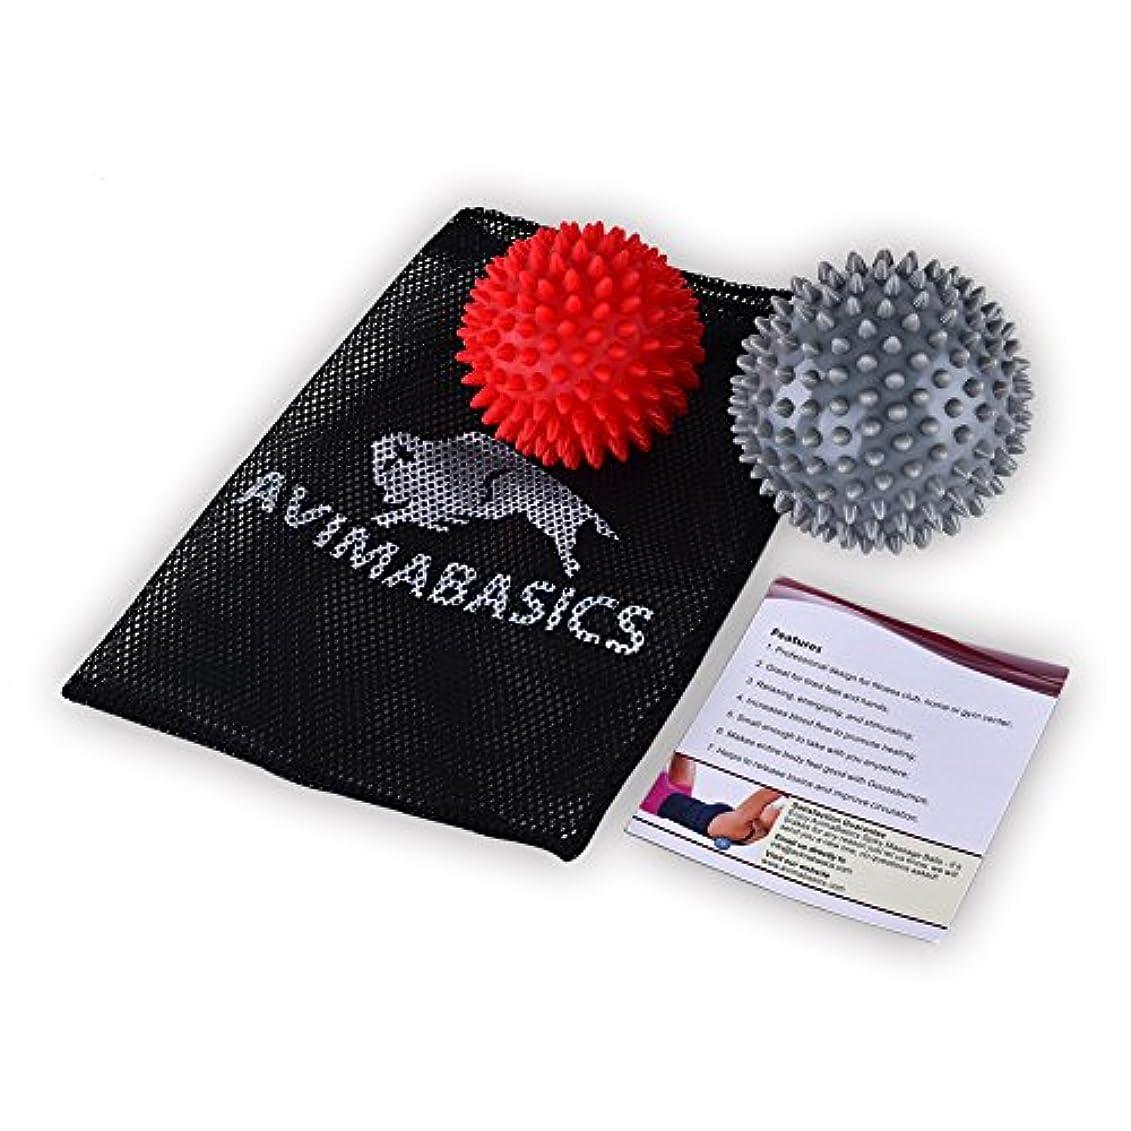 #1 BEST Spiky Massage Balls Reflexology Foot Body Arm Pain Stress Relief Trigger Point Sport Hand Exercise Muscle...